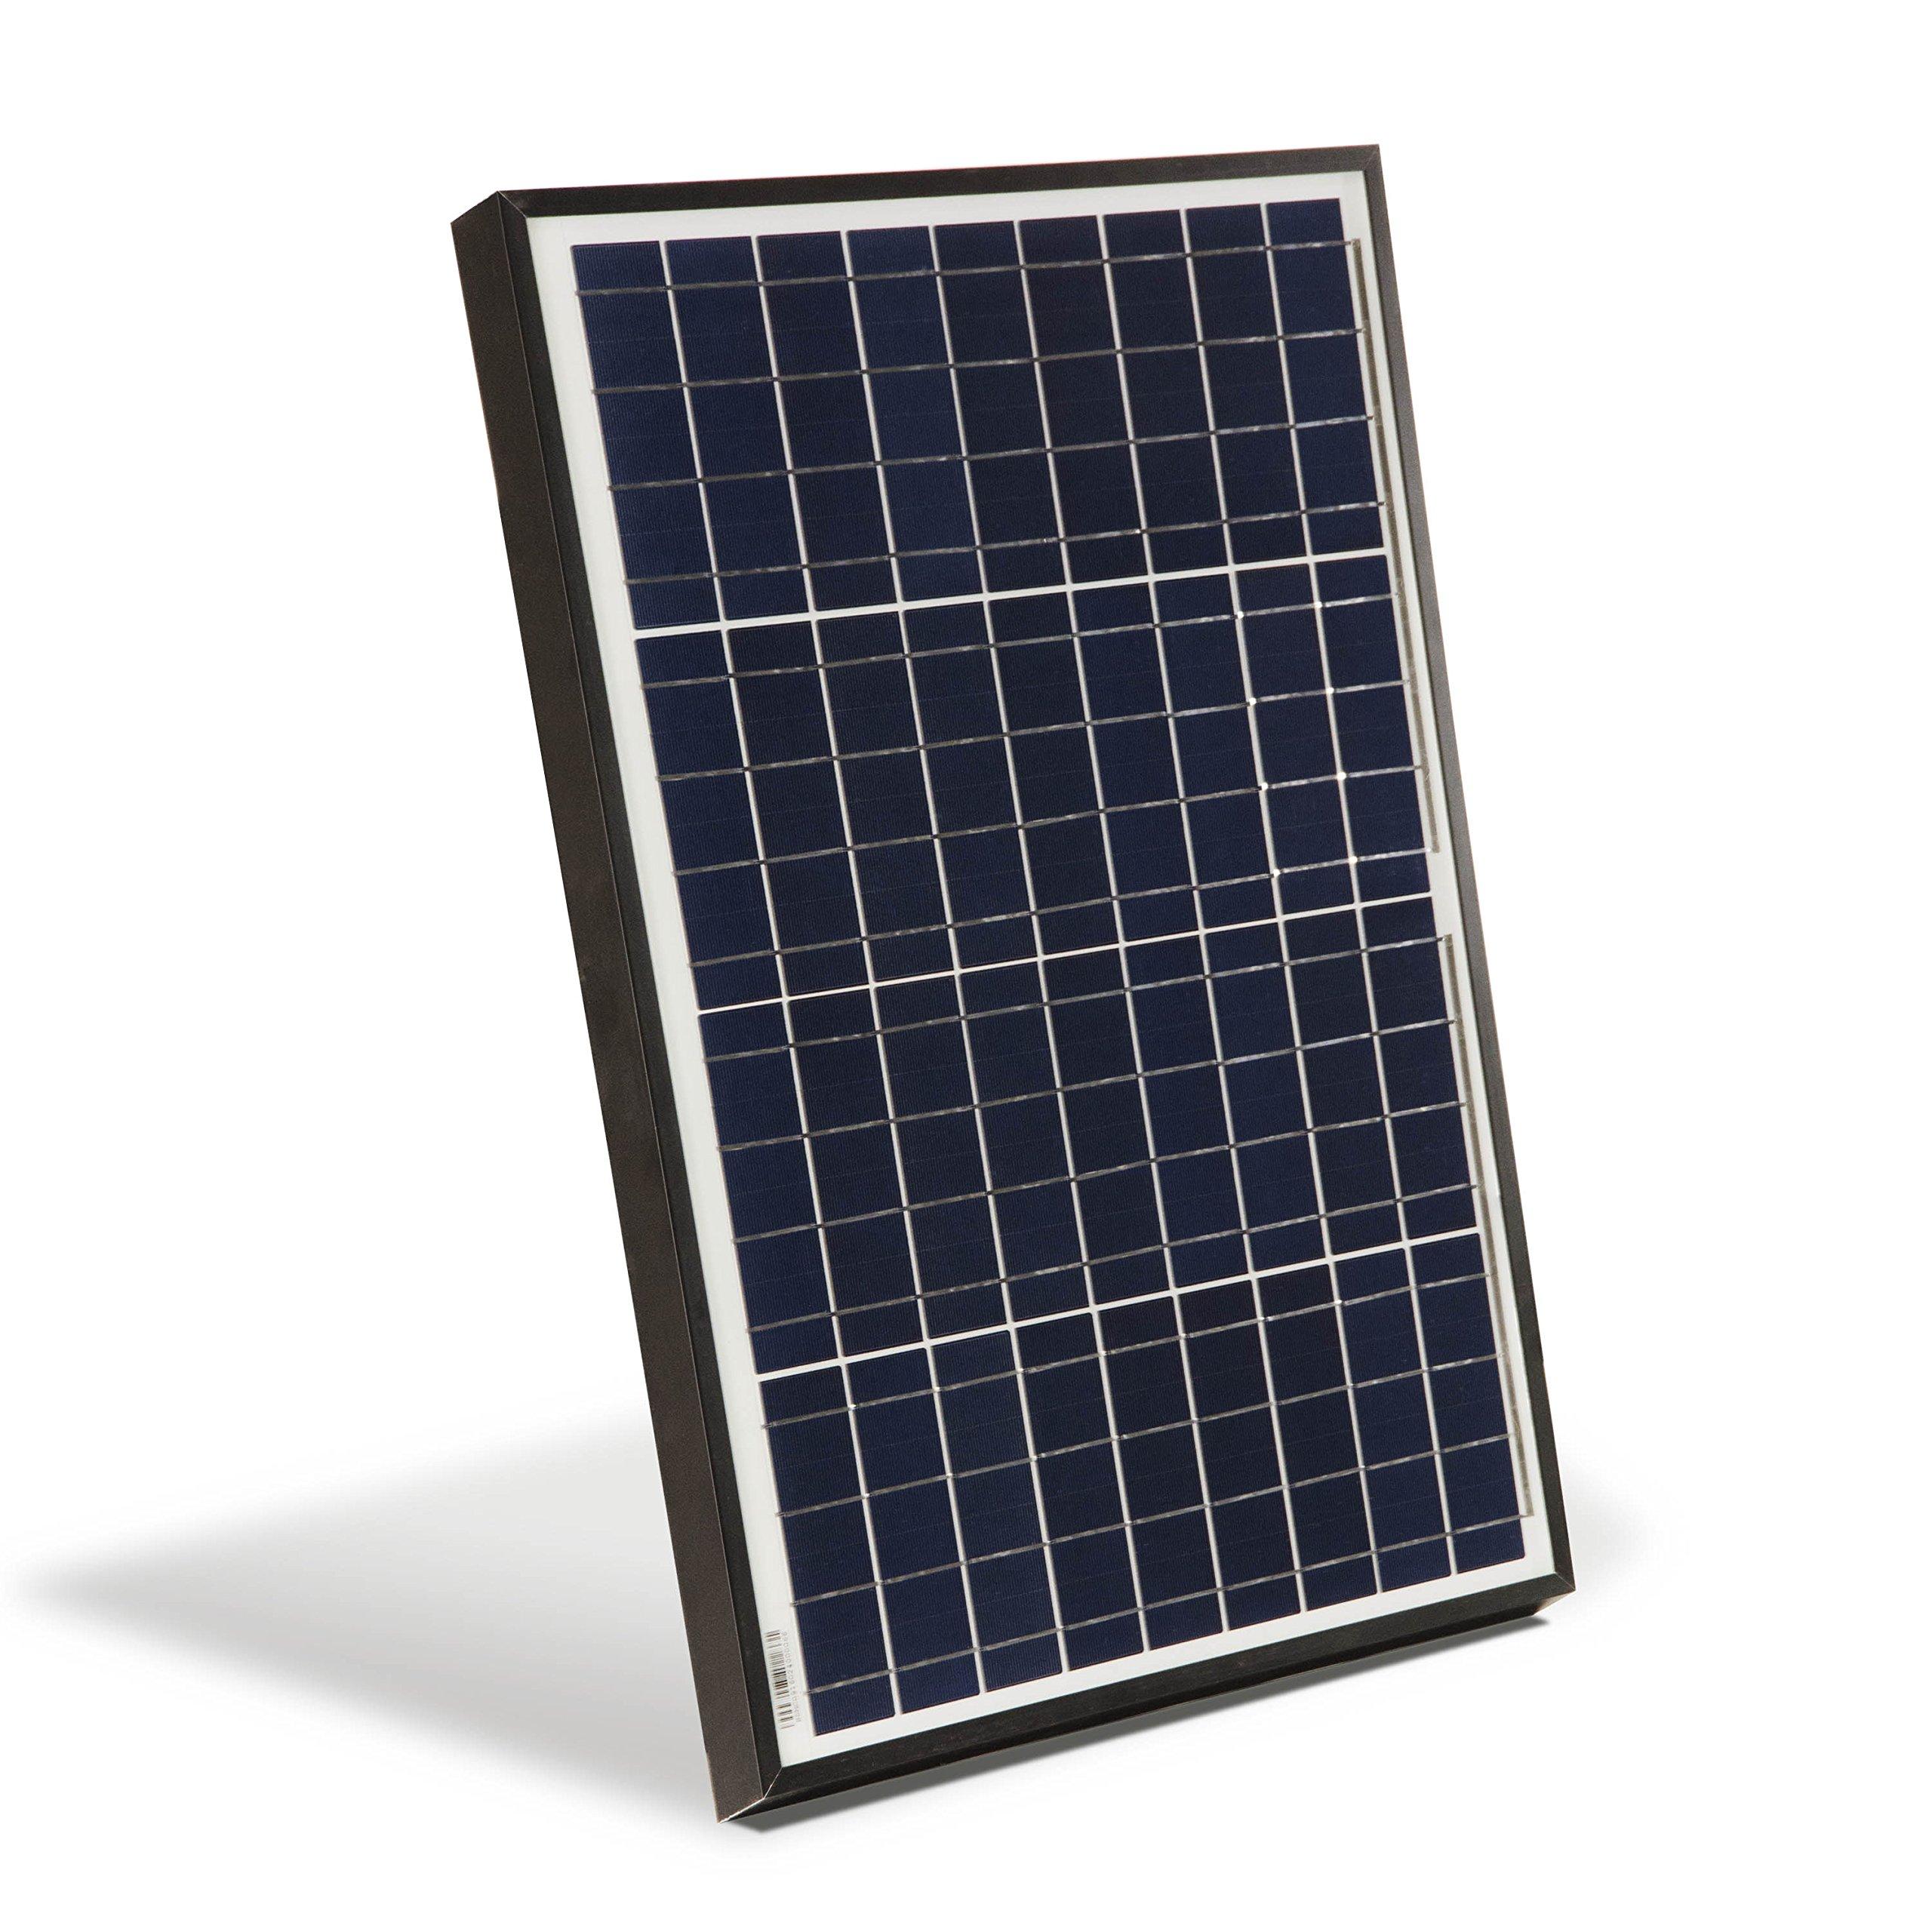 ALEKO PP40W12V 40 Watt 12 Volt Polycrystalline Solar Panel for Gate Opener Pool Garden Driveway